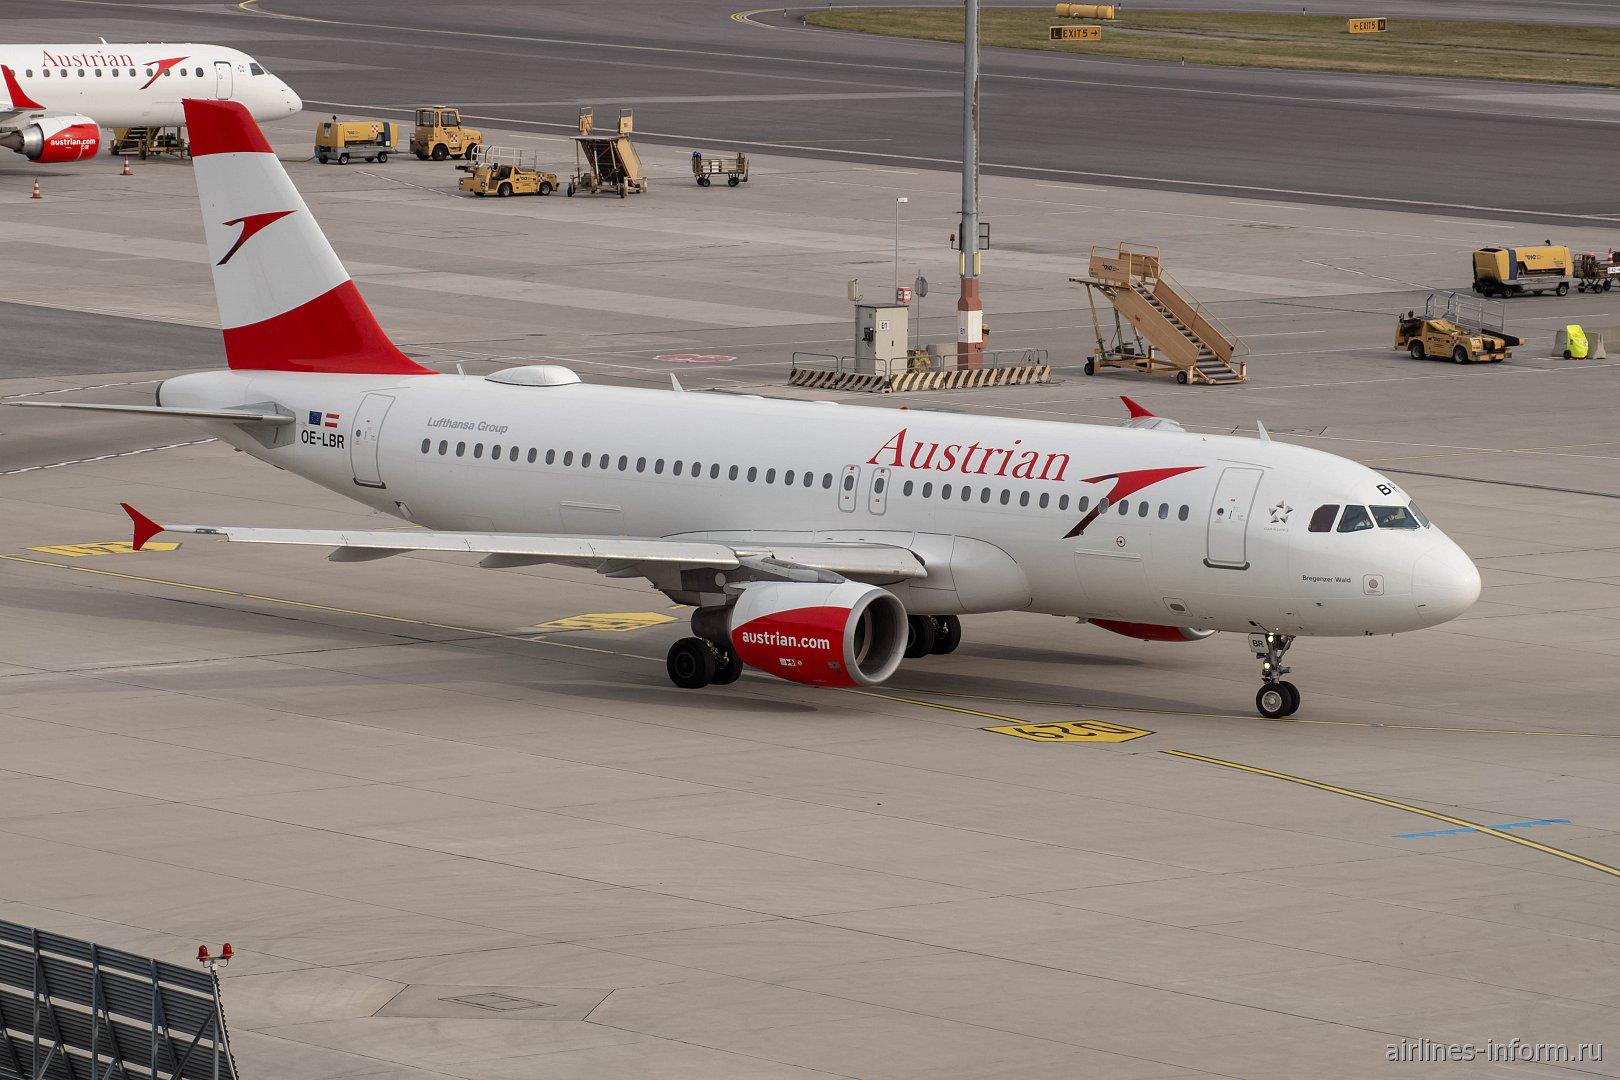 Airbus A320 OE-LBR авиакомпании Austrian в аэропорту Вена Швехат